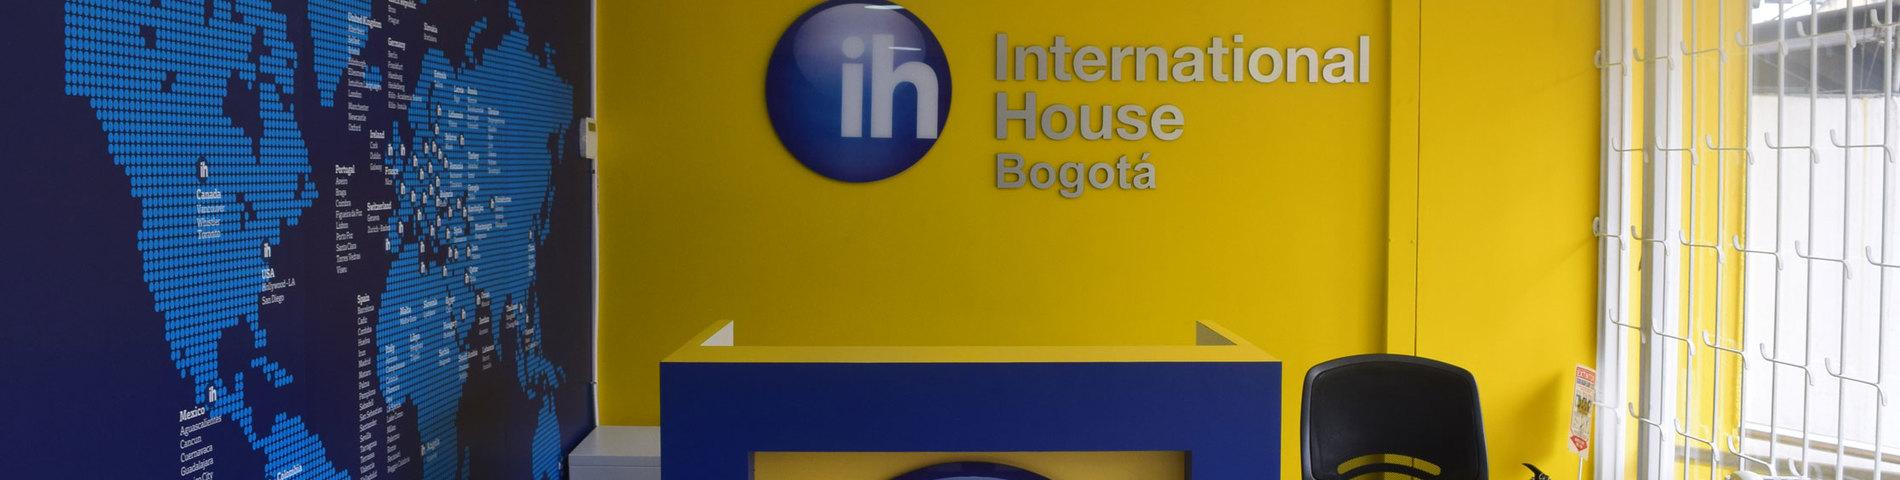 International House Bogota รูปภาพ 1